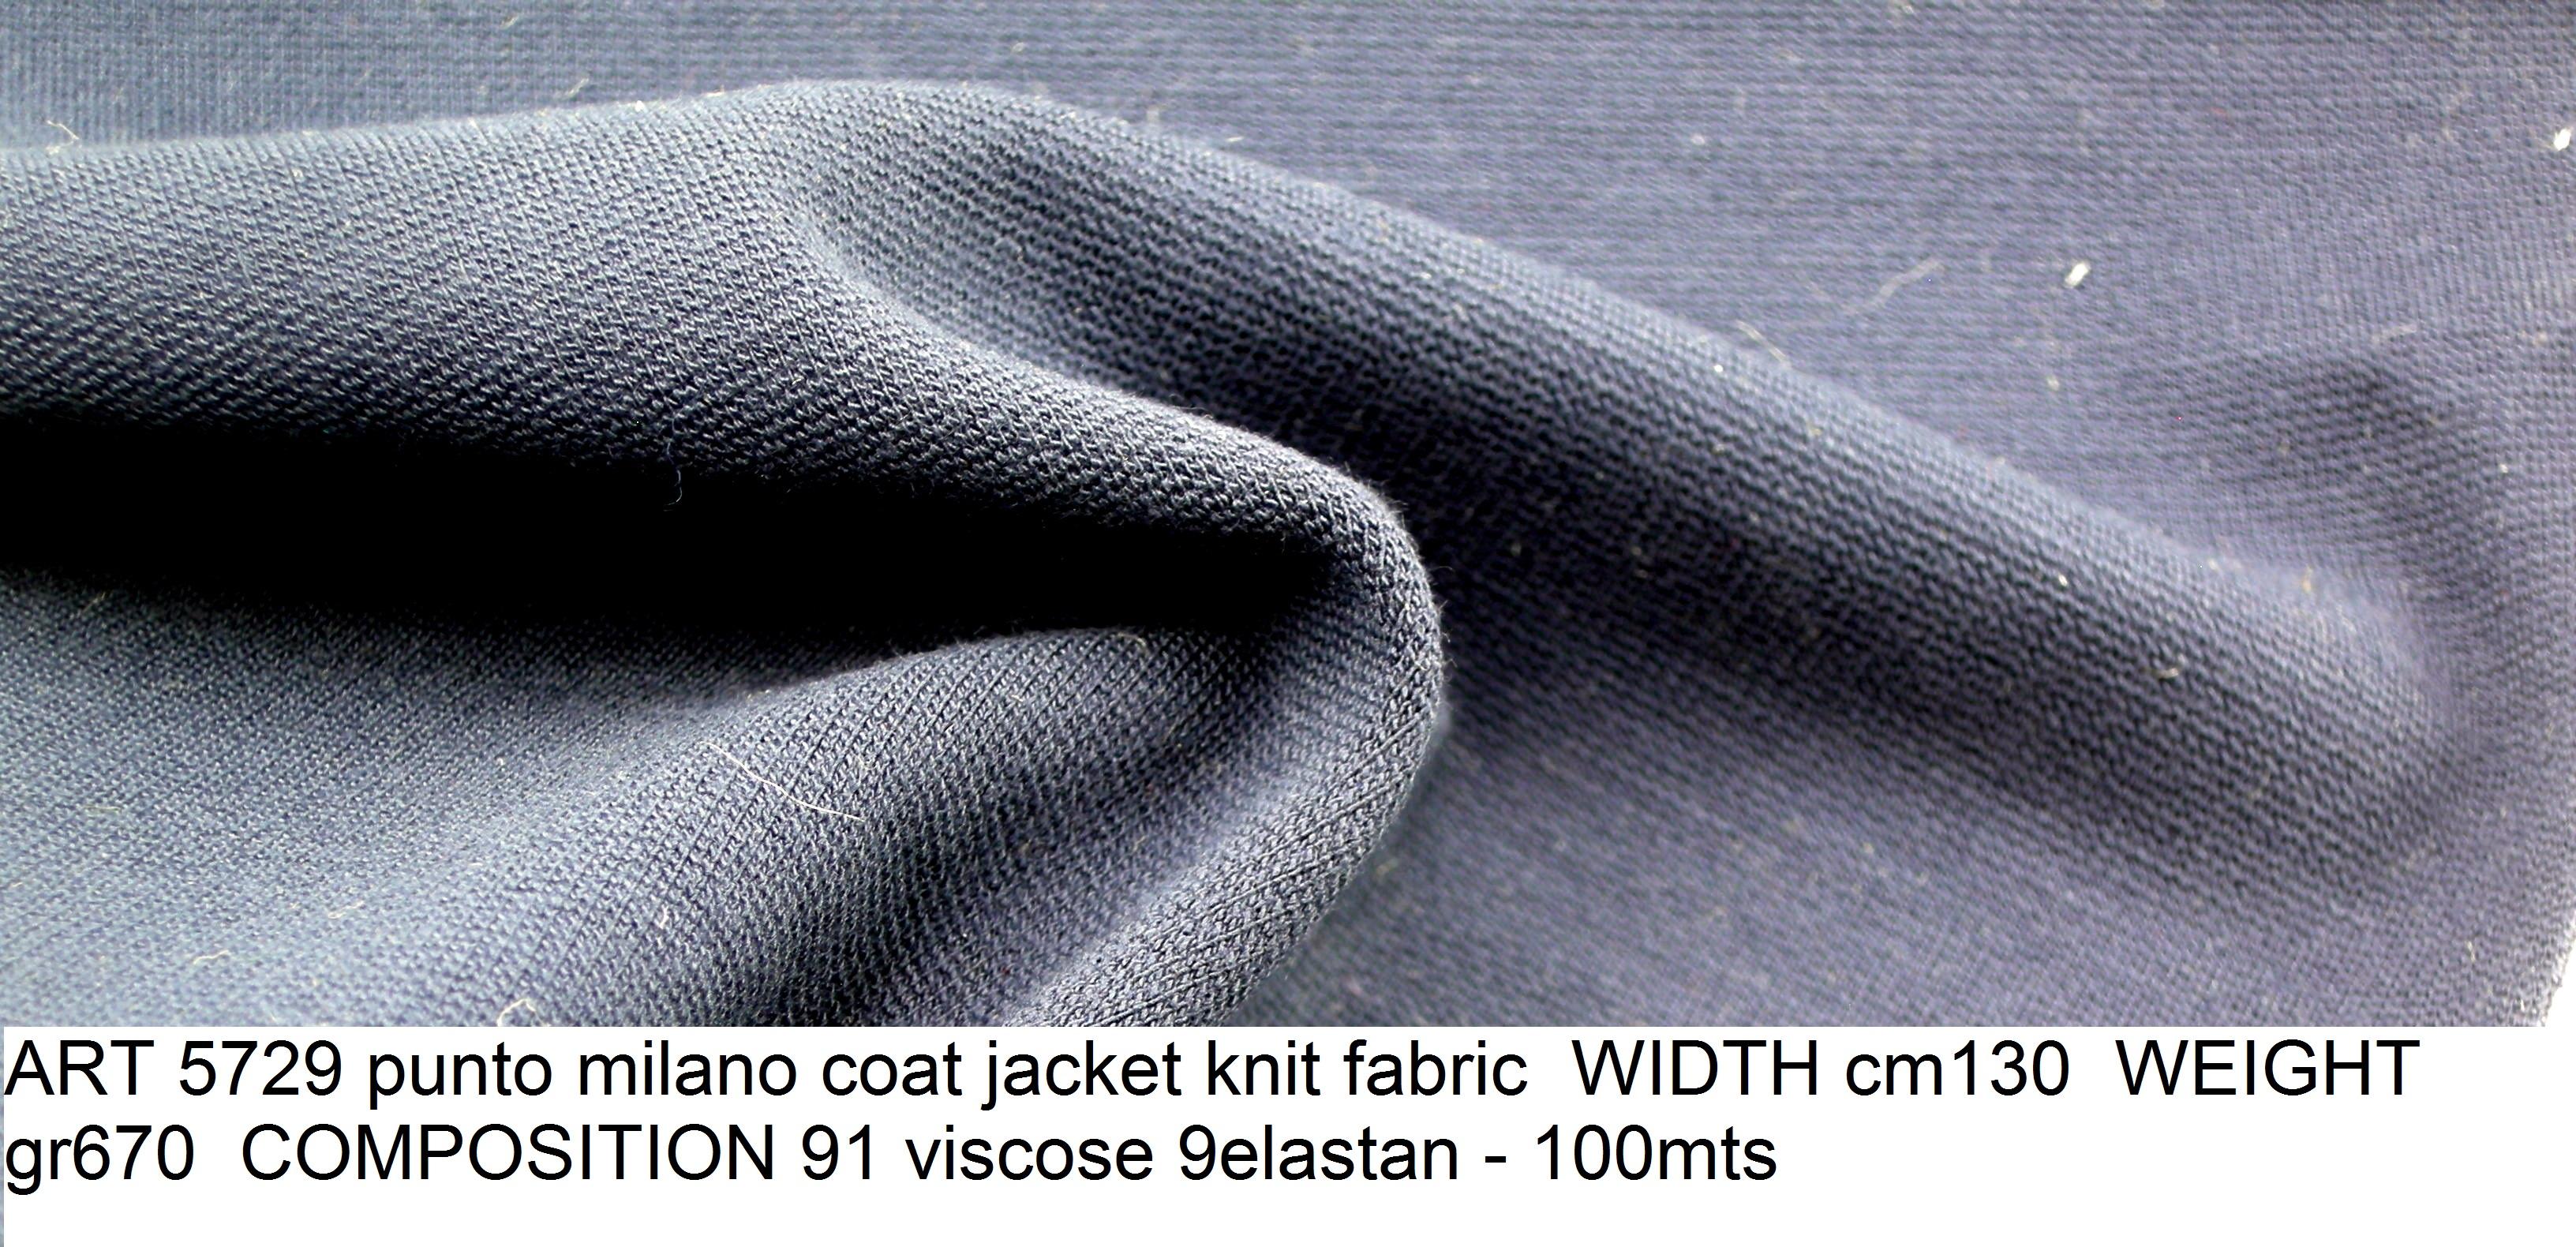 ART 5729 punto milano coat jacket knit fabric WIDTH cm130 WEIGHT gr670 COMPOSITION 91 viscose 9elastan - 100mts